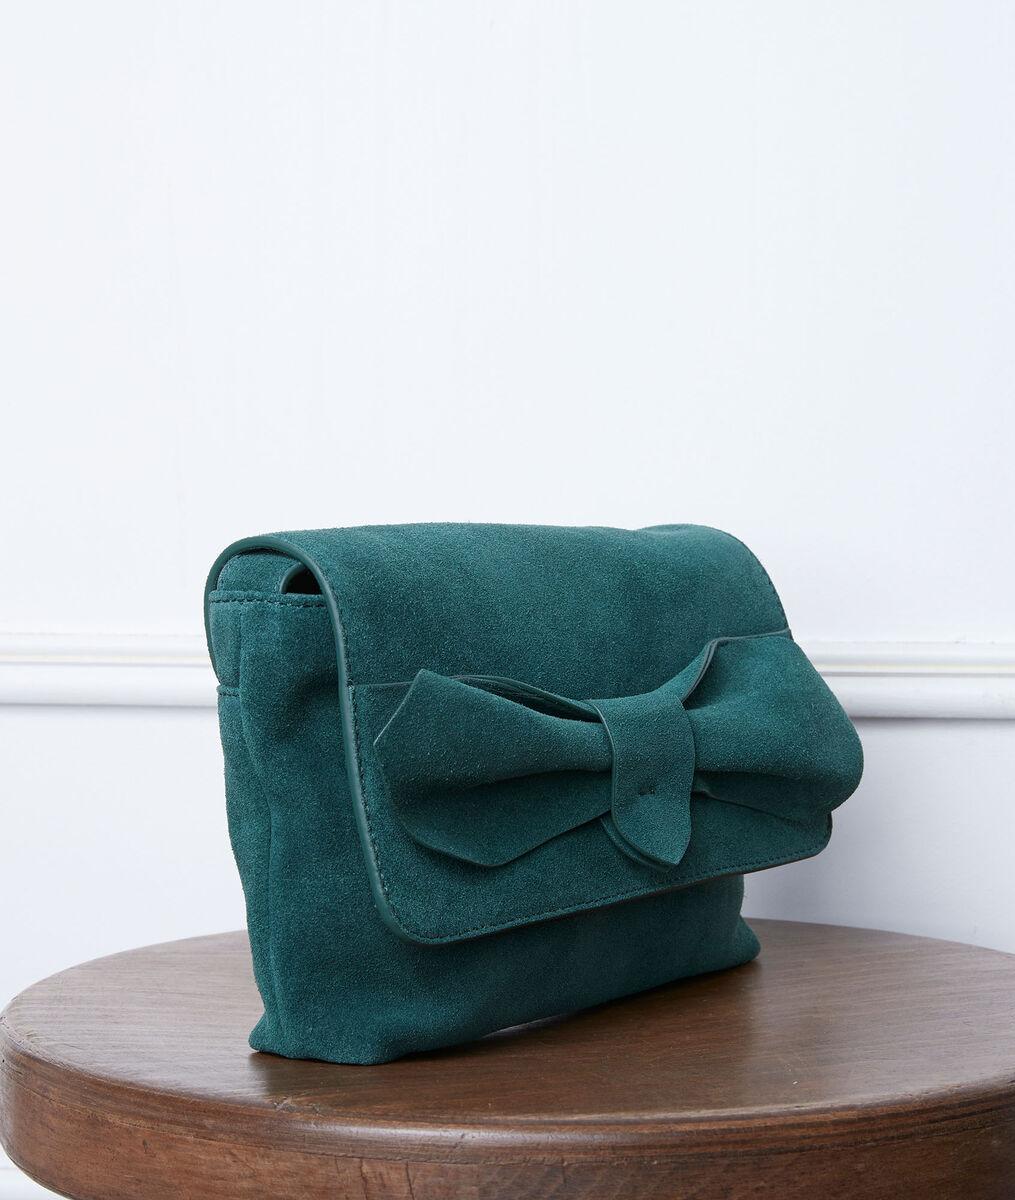 Sac en cuir vert Dolly PhotoZ   1-2-3